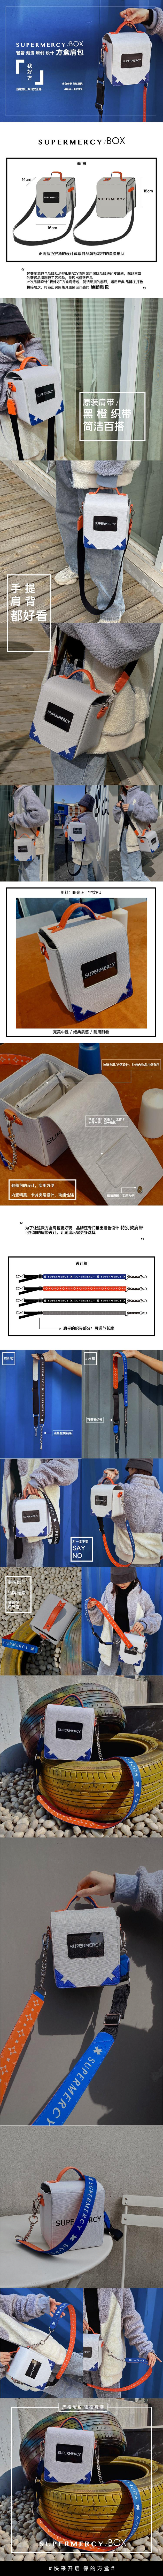 box详情页2-02.jpg